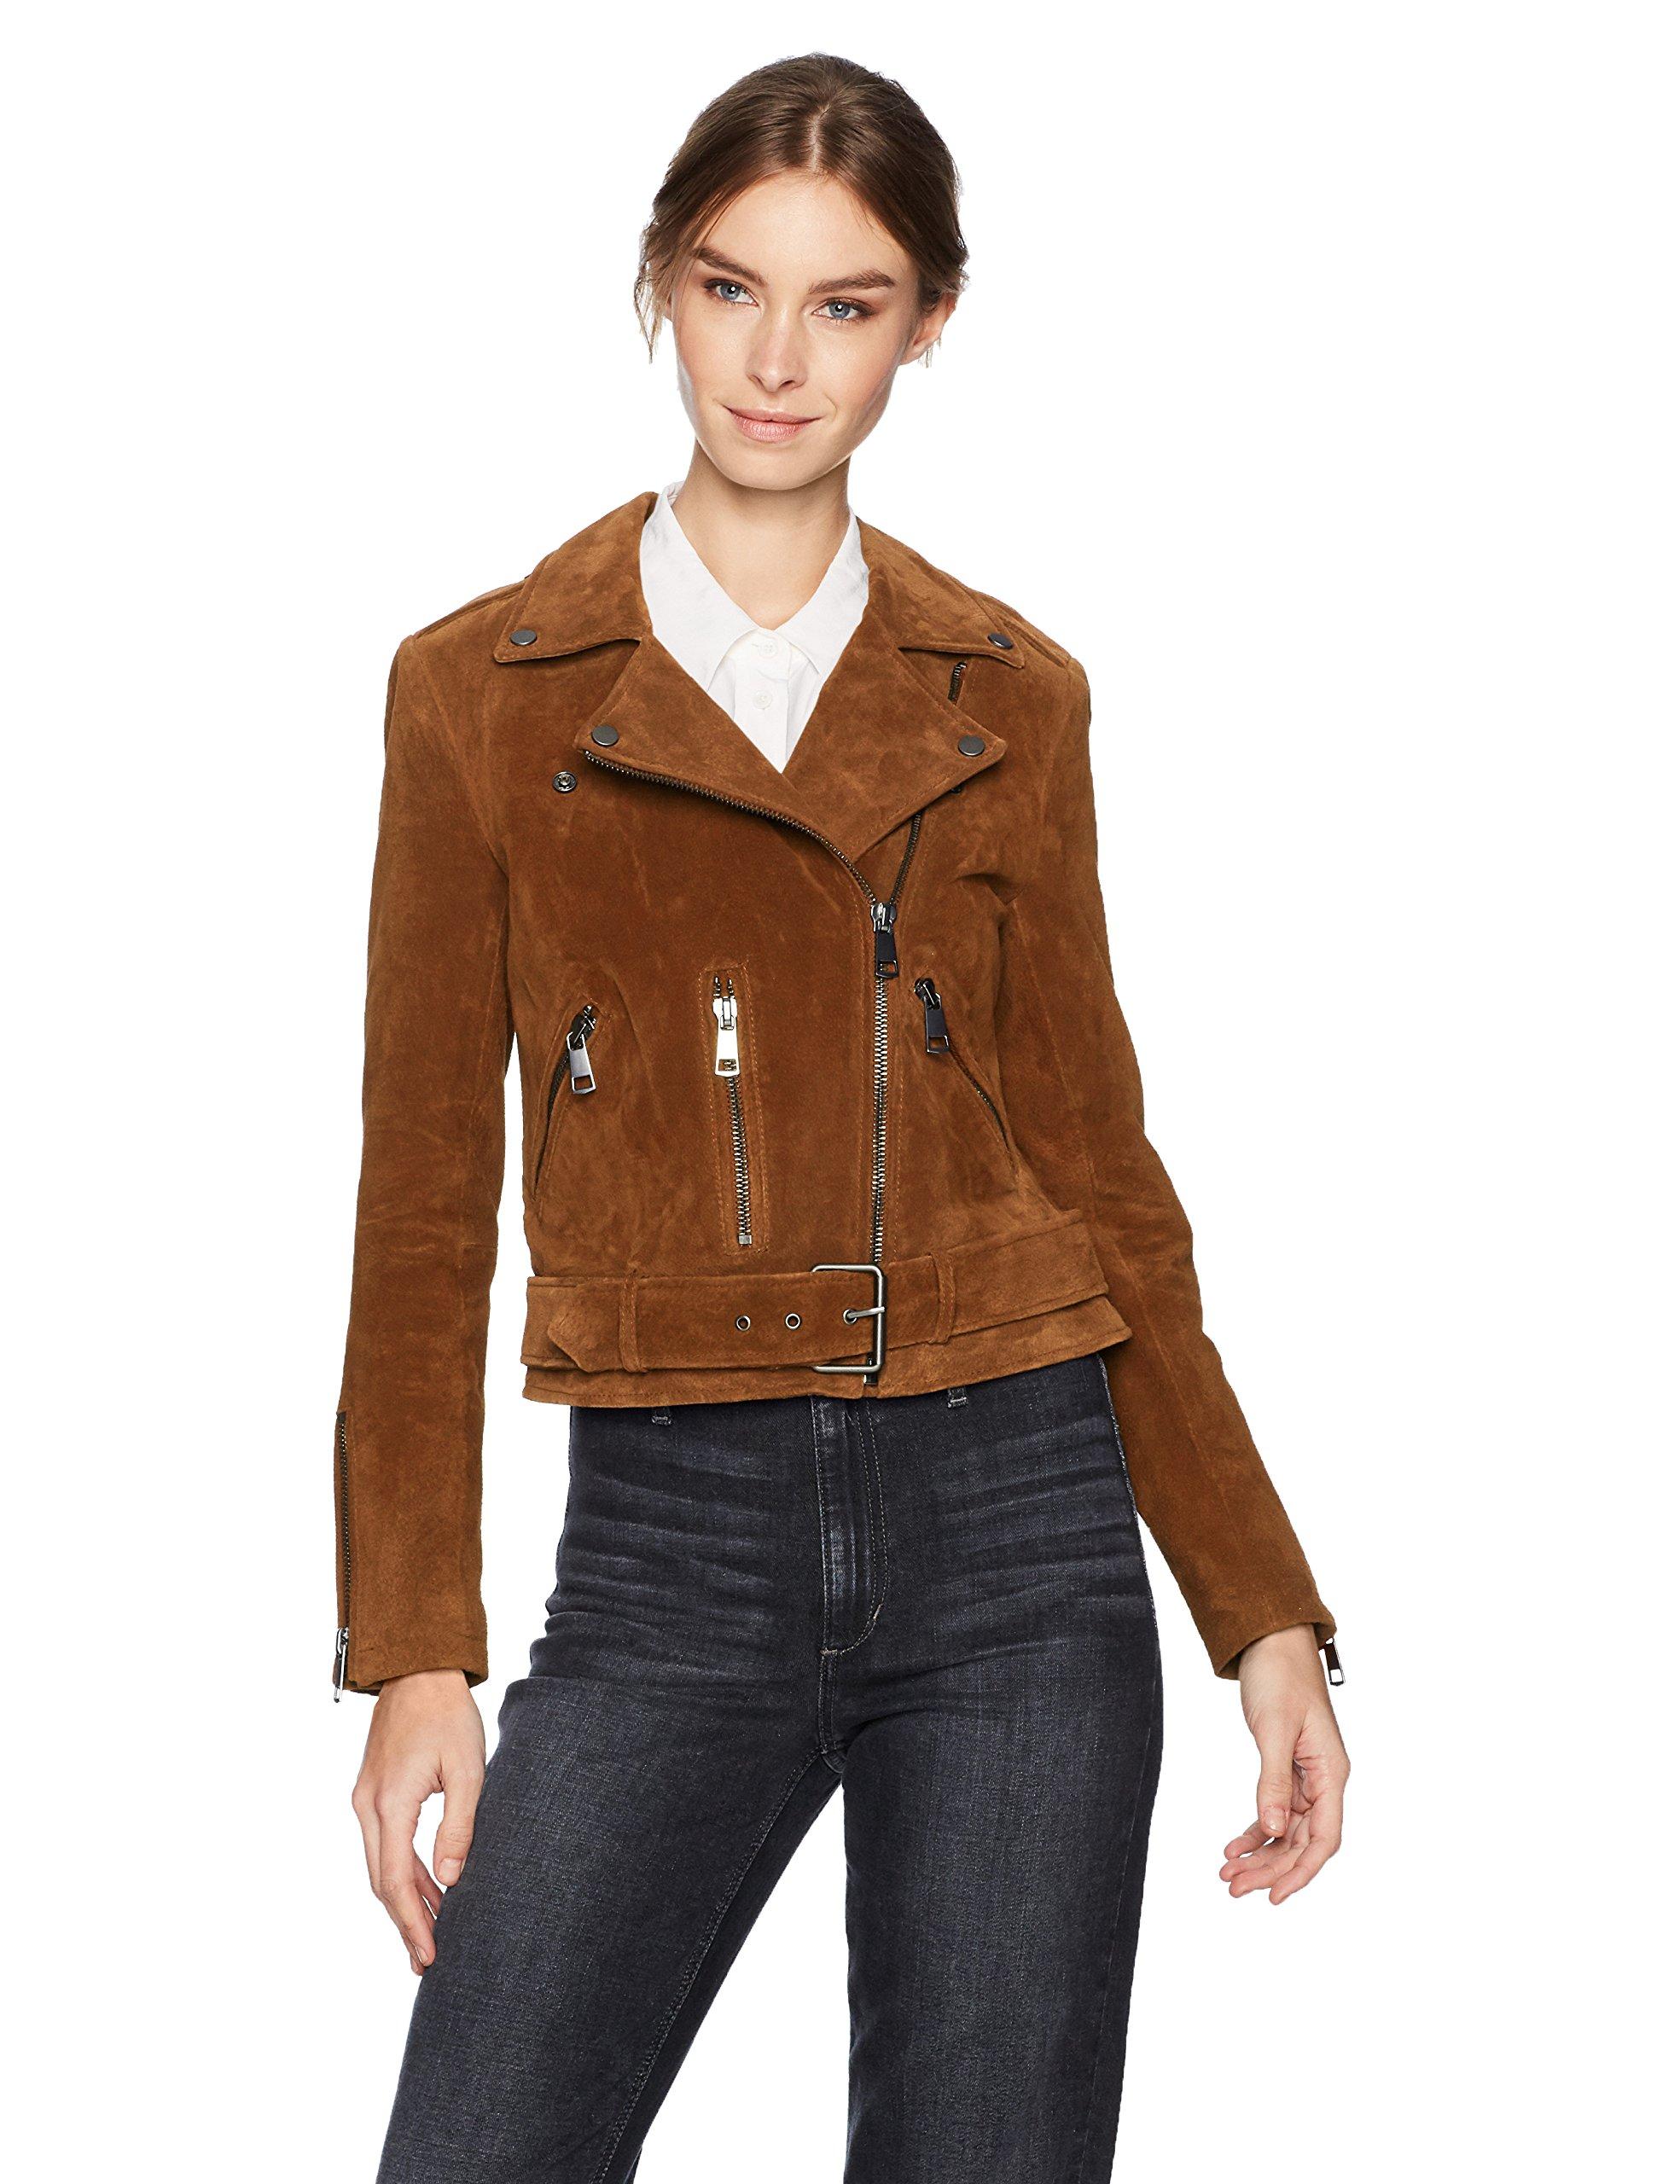 Bagatelle Women's Suede Belted Biker Jacket, Brandy, Extra Small